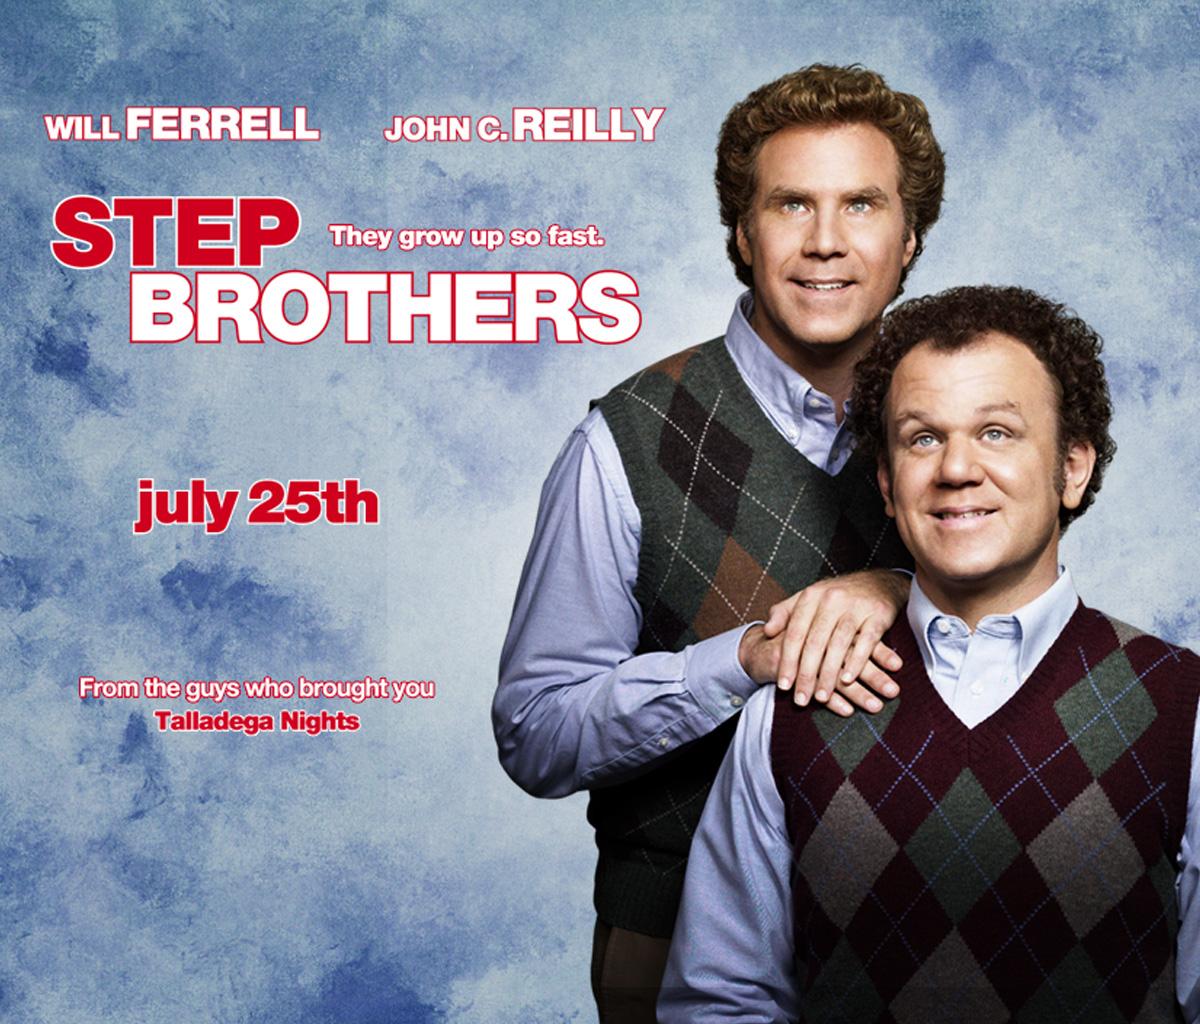 Will_Ferrell_in_Step_Brothers_Wallpaper_11_800.jpg